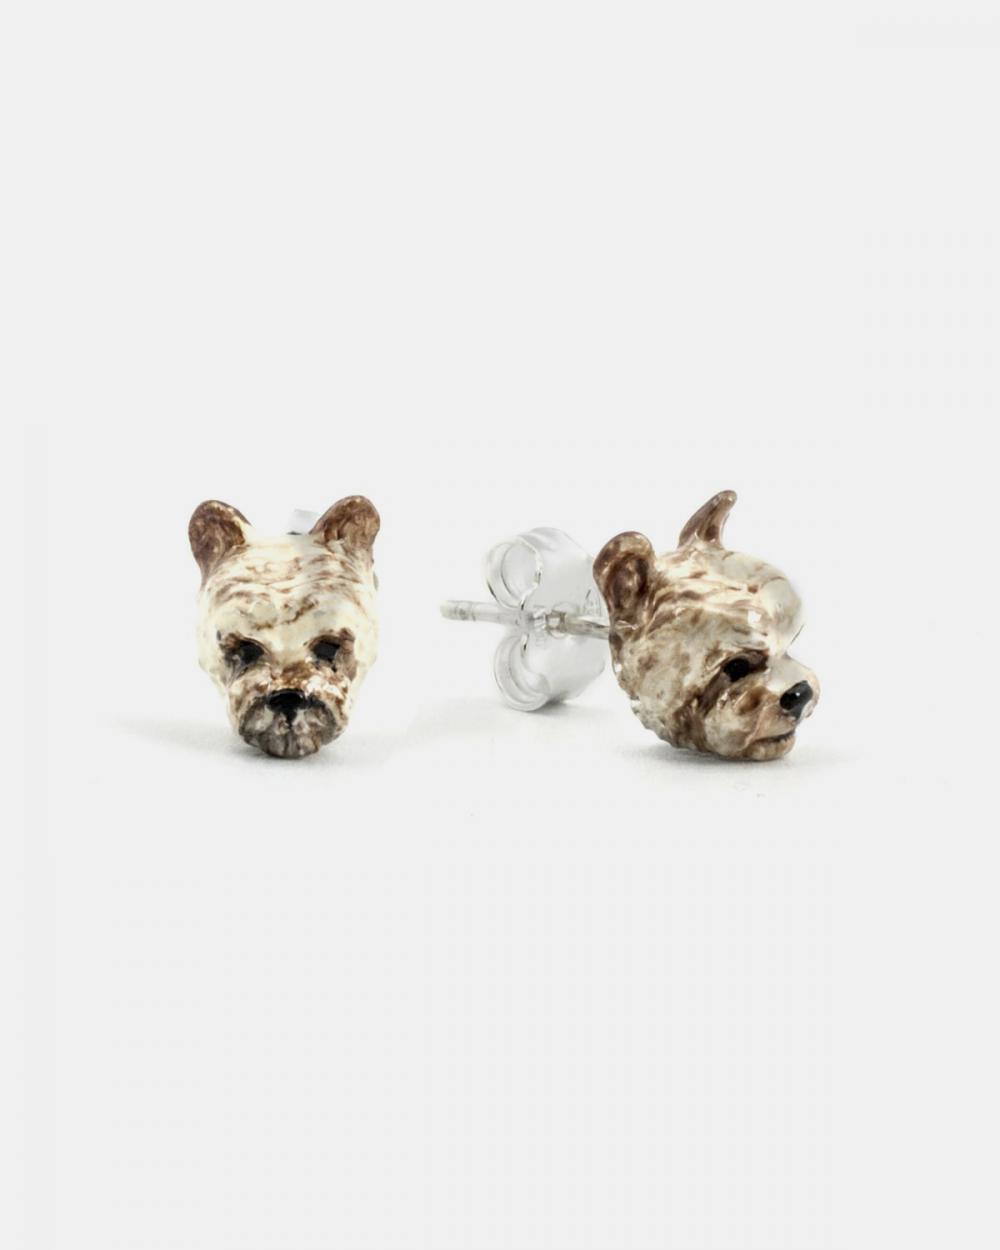 Earrings YORKSHIRE COUPLE EARRINGS / ENAMELLED NOVE25